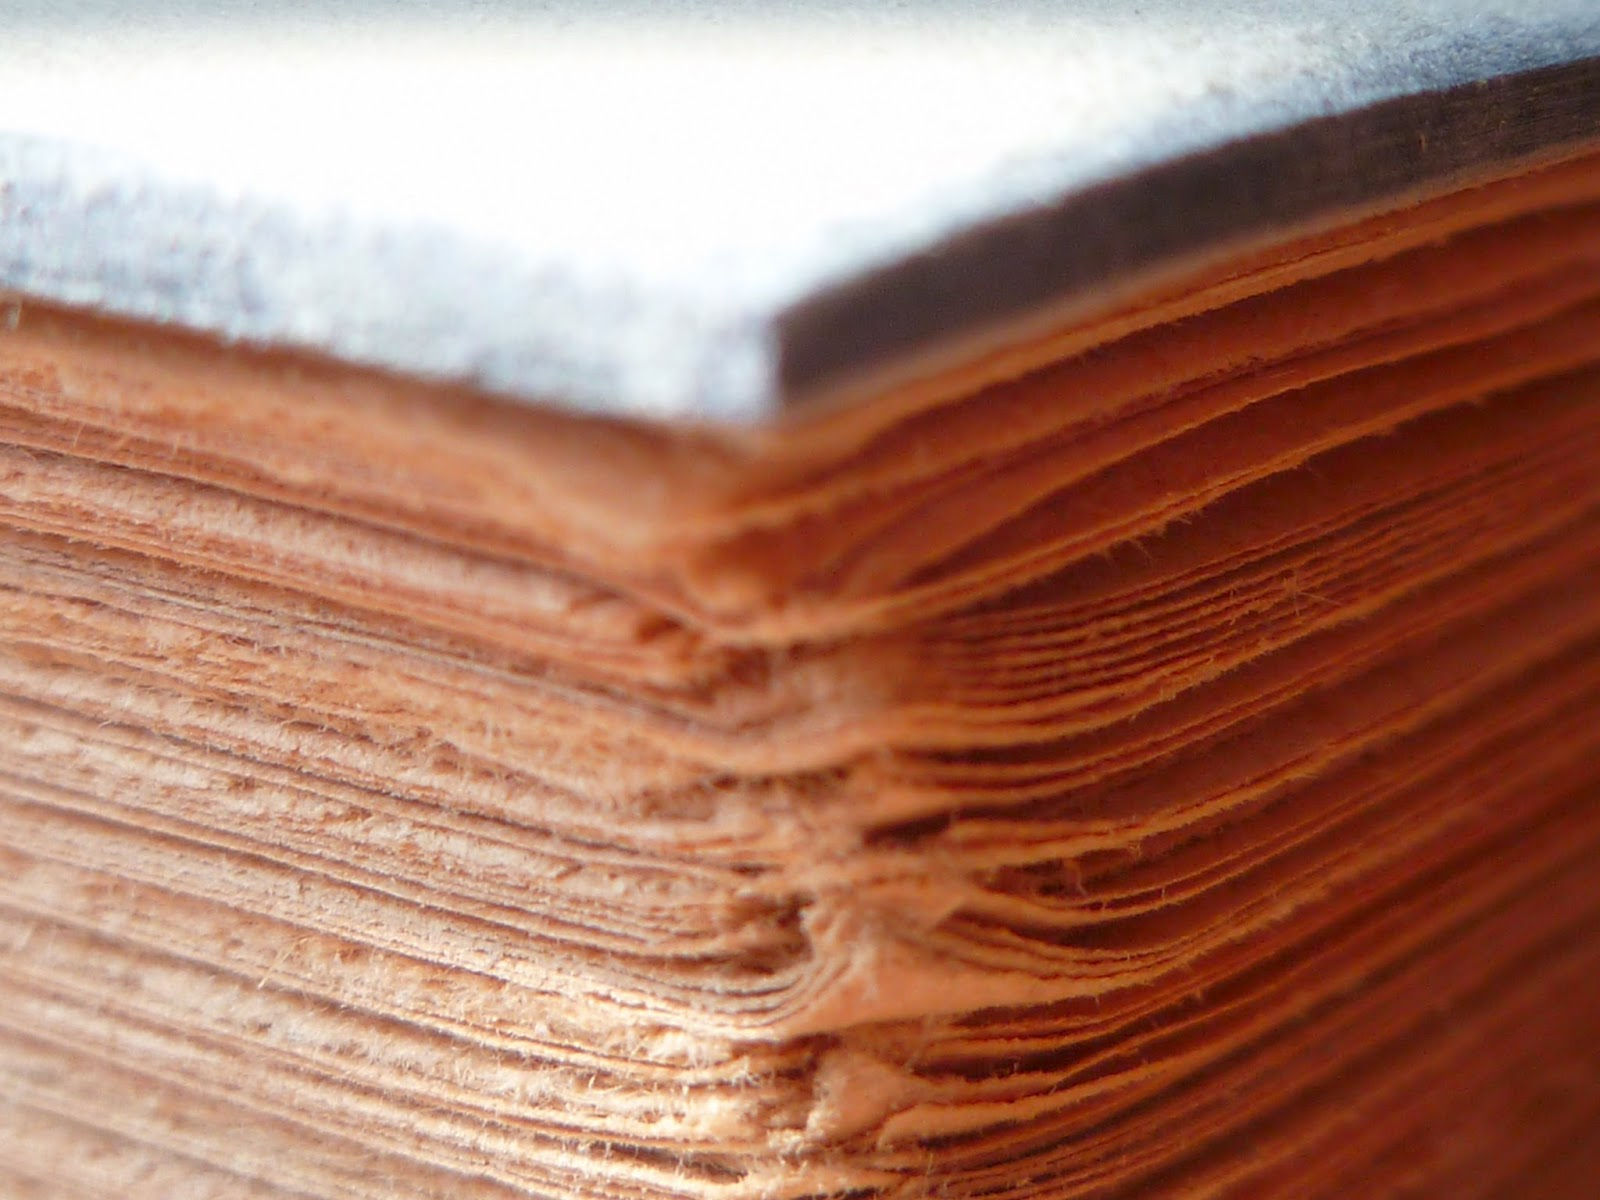 Restauration de livres anciens.: Vérification des mors des cartons #772B14